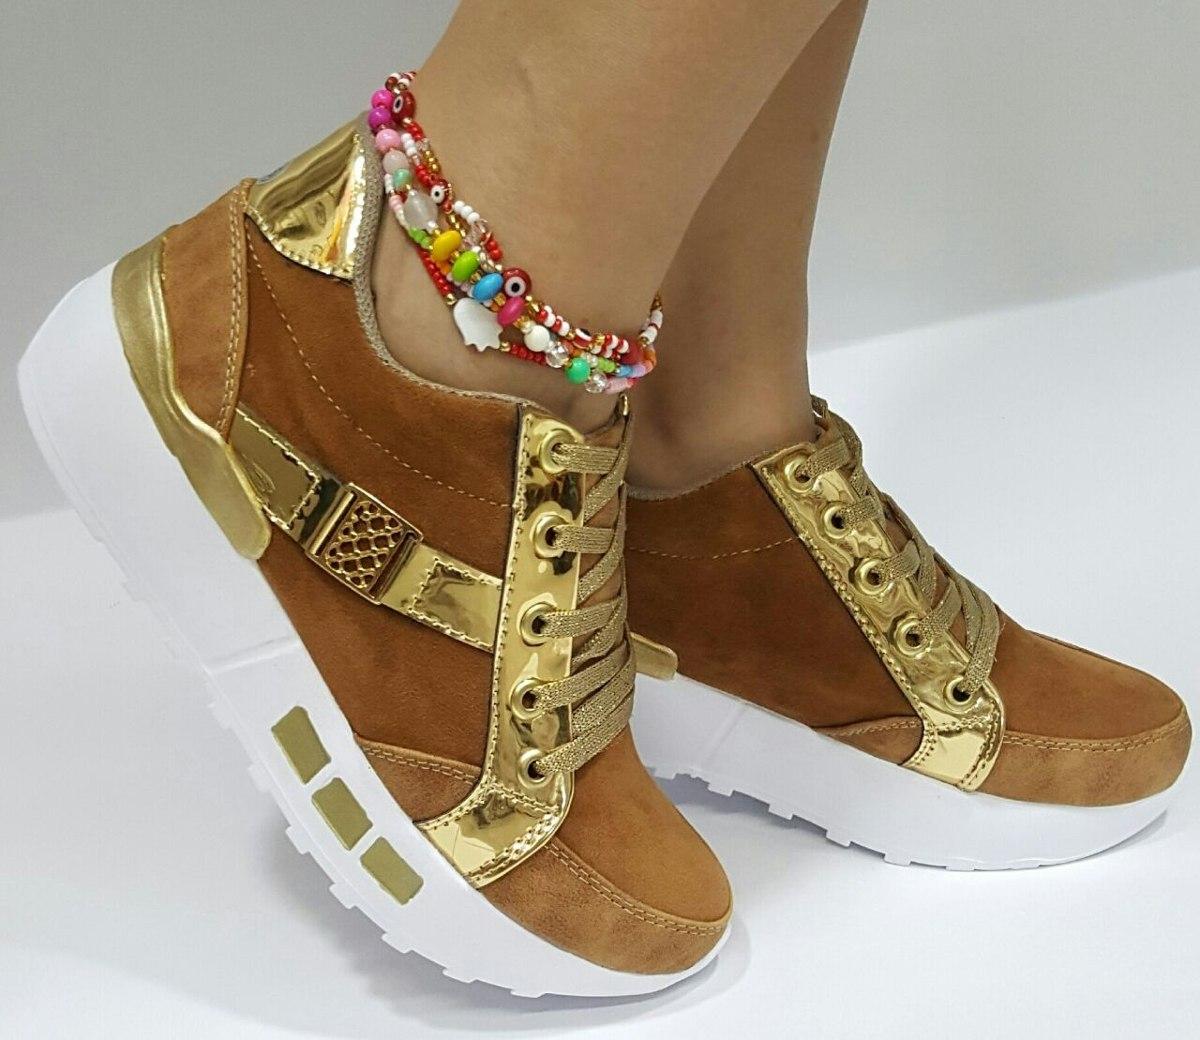 a73f64c5091 bota casual para dama calzado colombiano moda 2016. Cargando zoom.